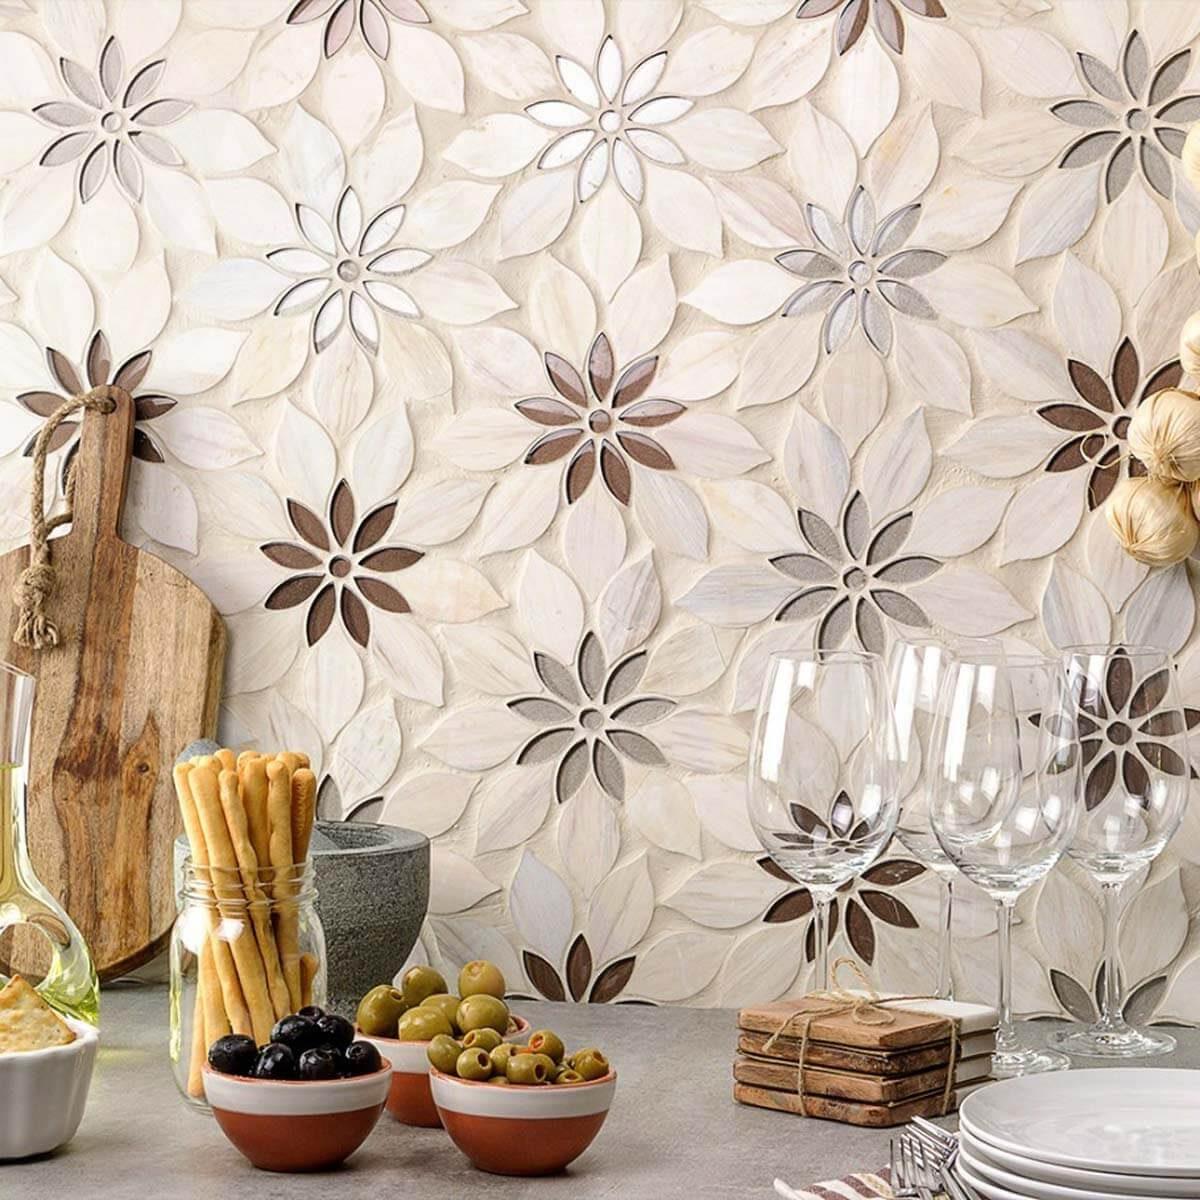 30 Kitchen Backsplash Ideas Taste Of Home